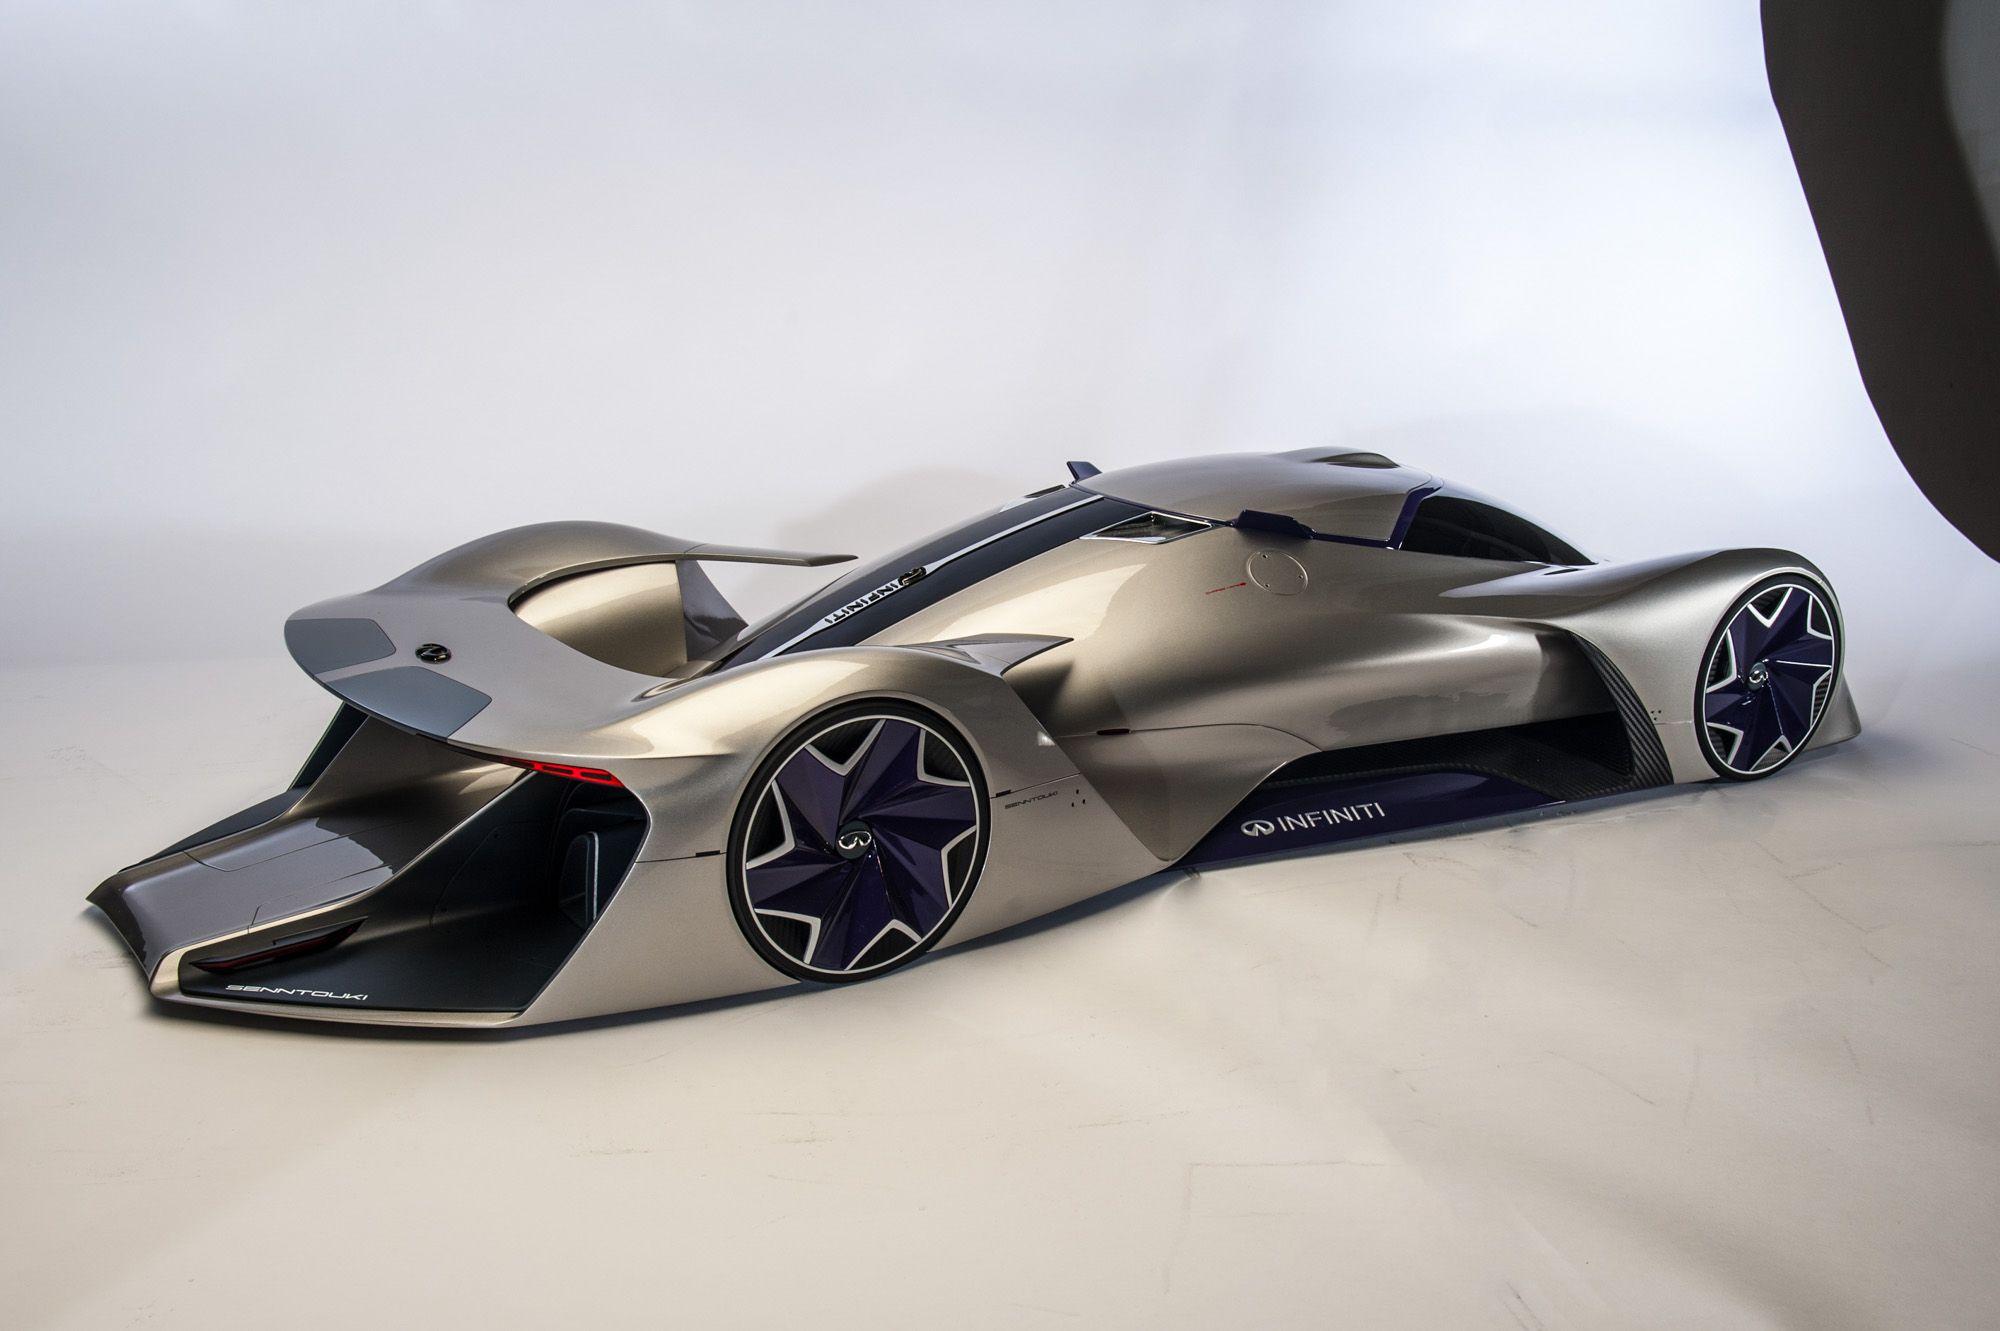 Li Pforzheim Ma S16 22 Concept Cars Concept Car Design Futuristic Cars